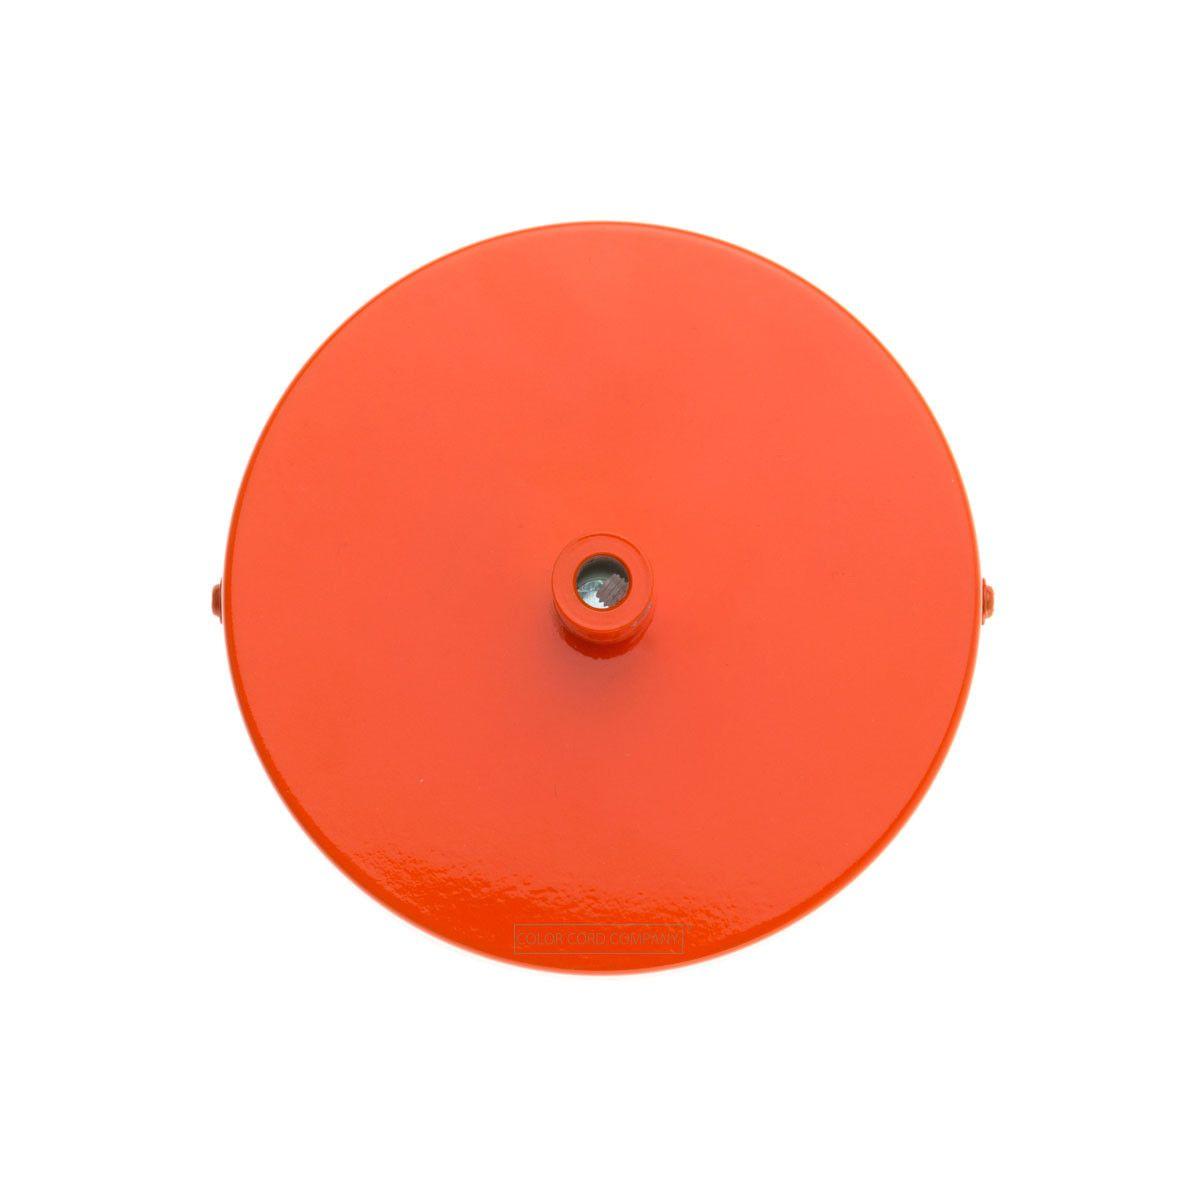 Single Port Ceiling Canopy - Orange